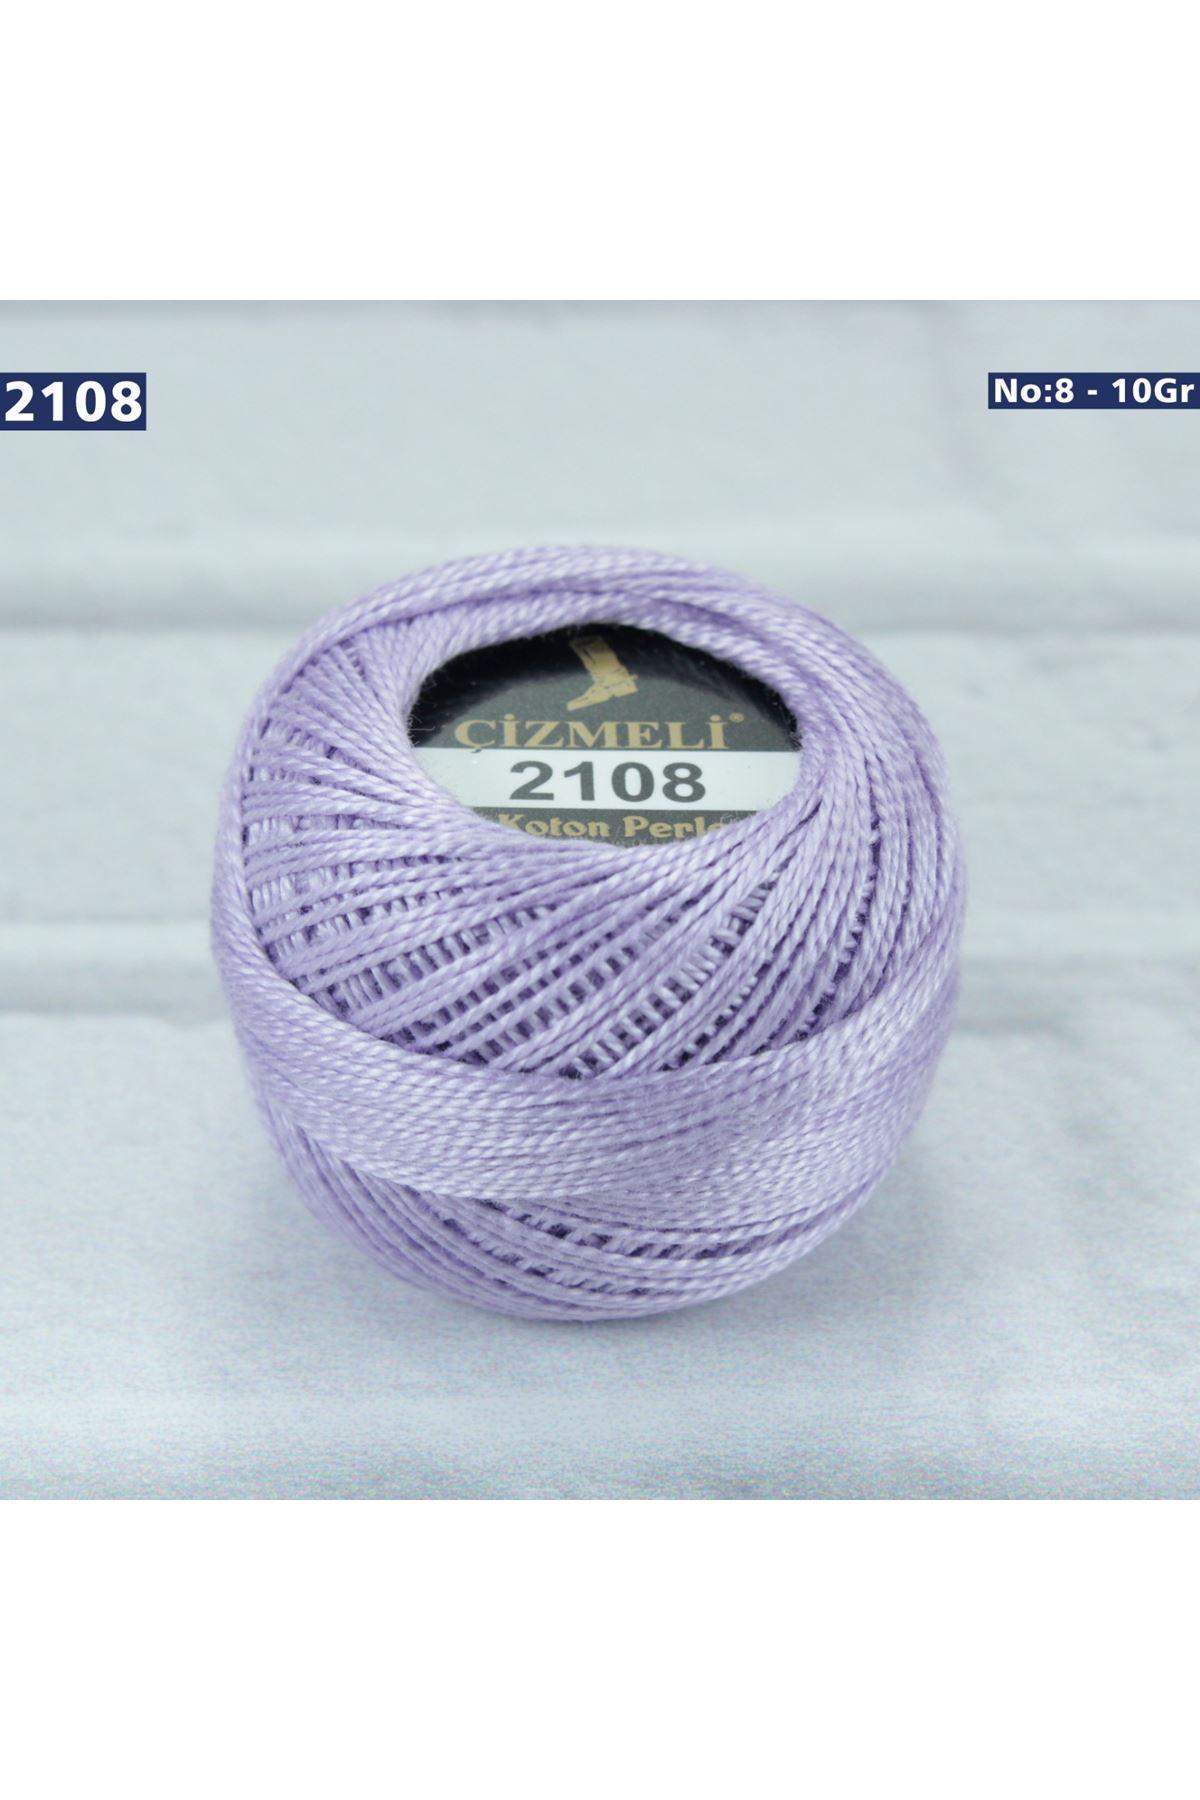 Çizmeli Cotton Perle Nakış İpliği No: 2108